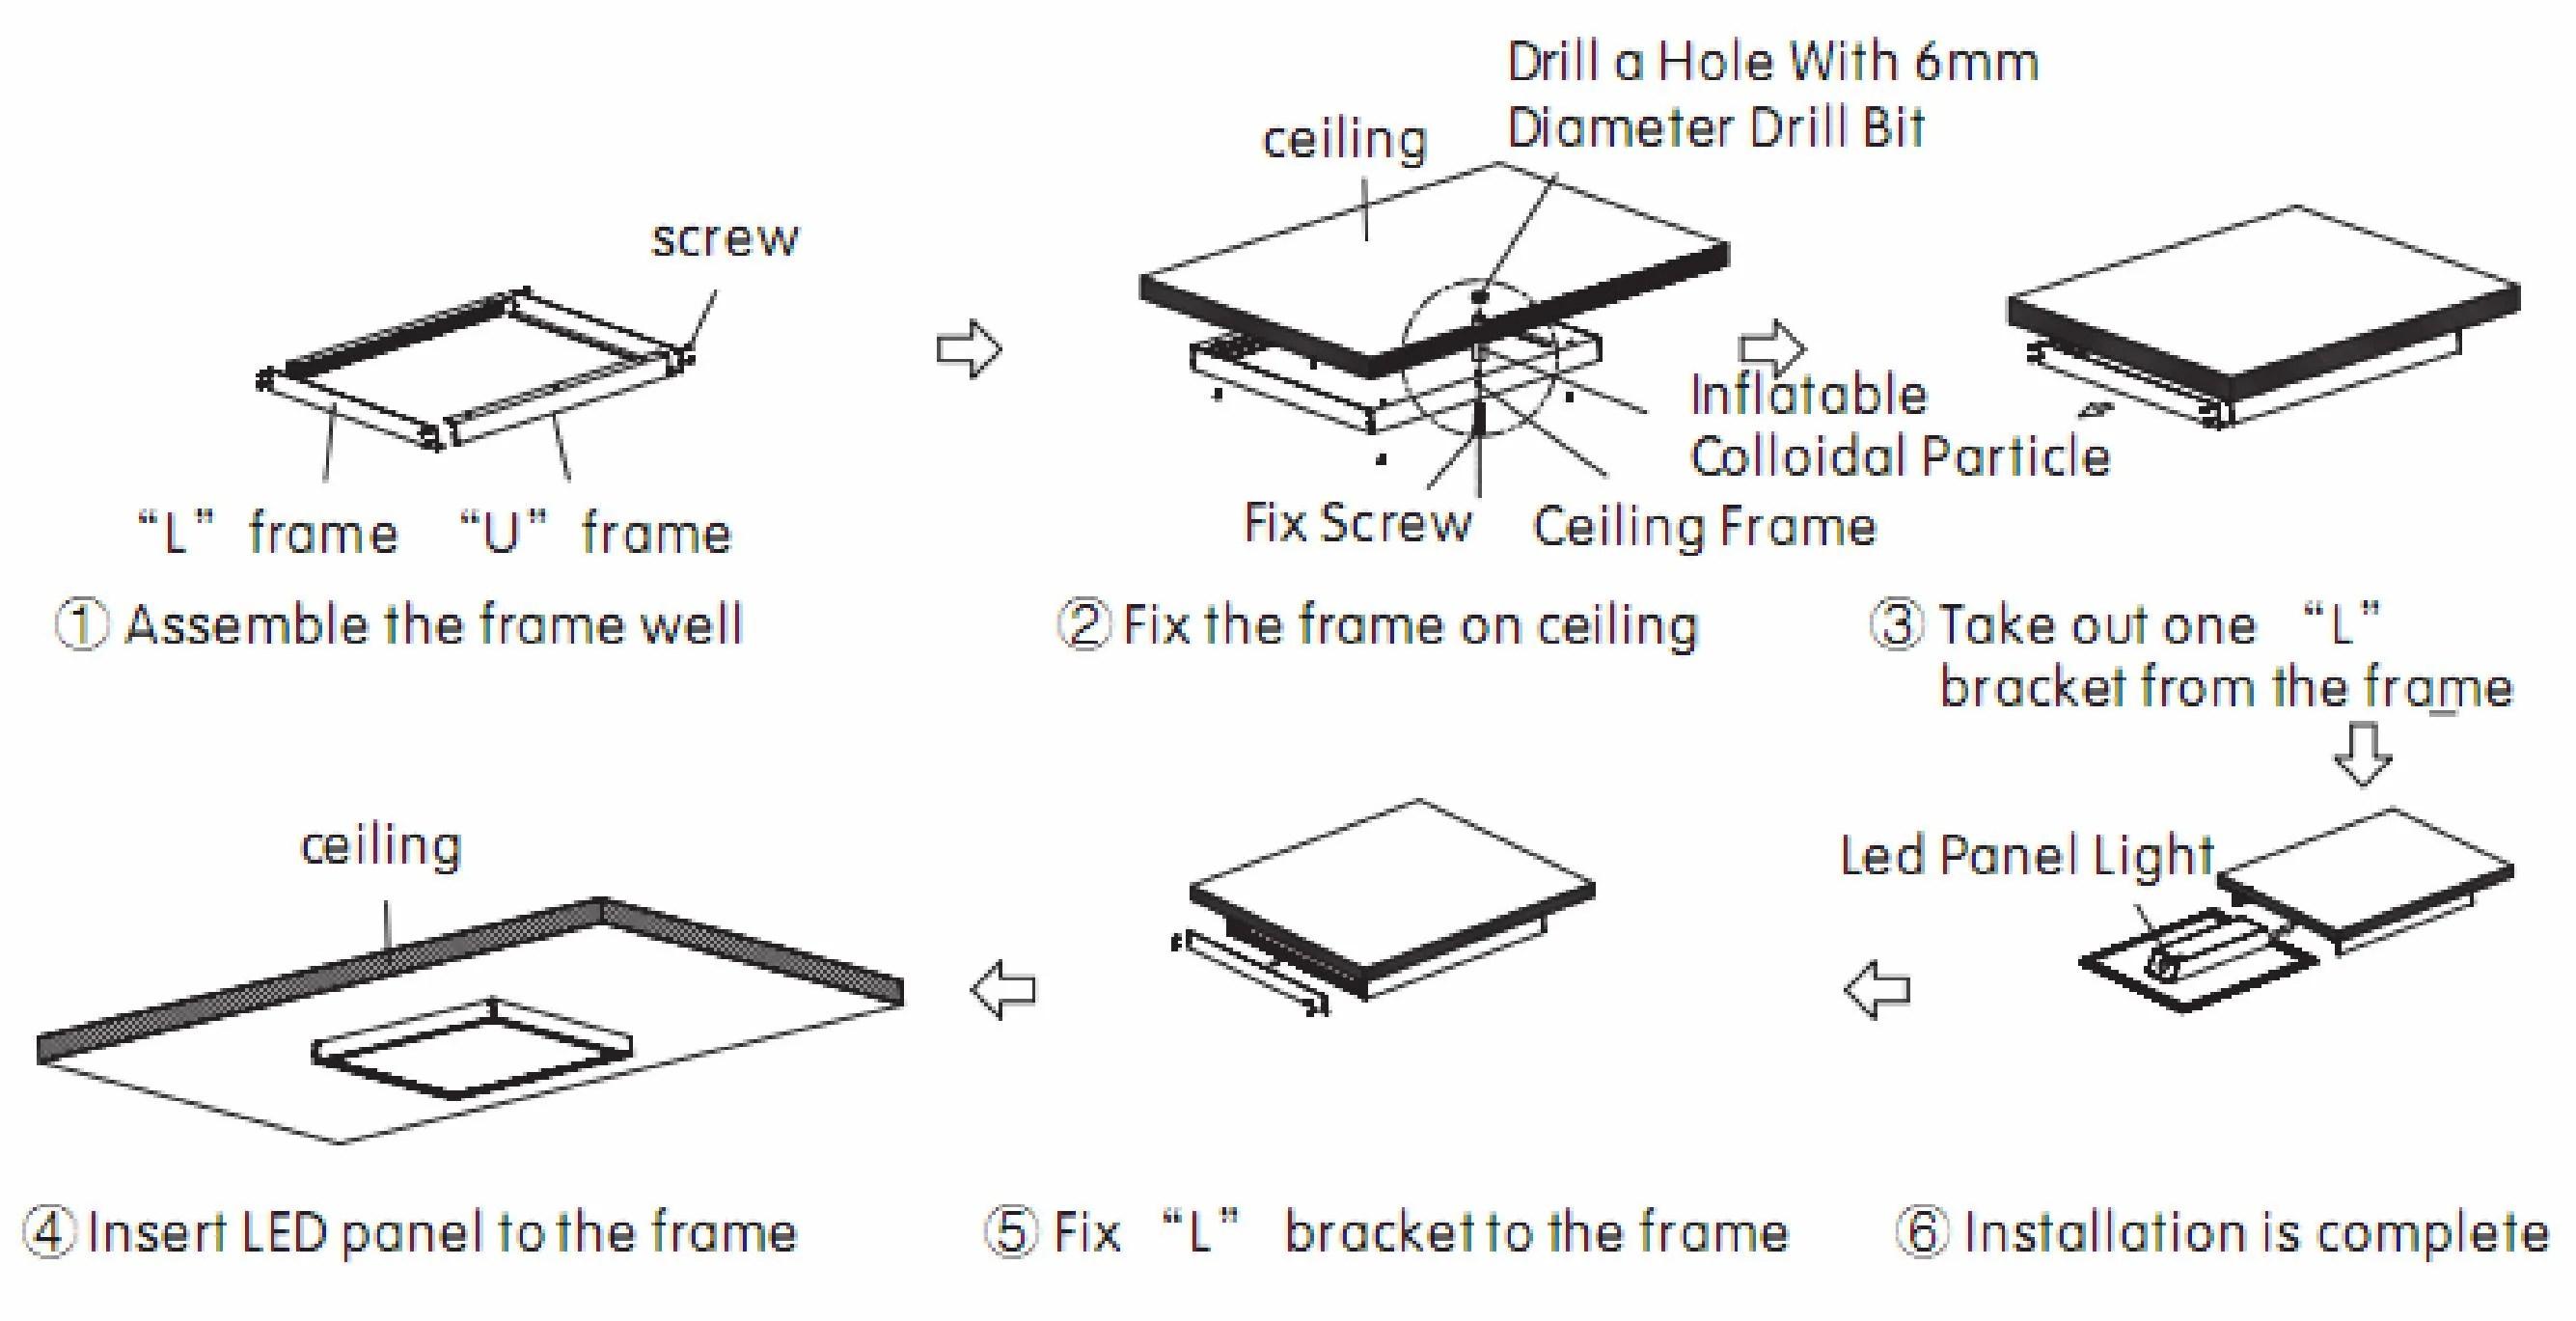 led panel diagram data wiring diagramsled panel diagram schema wiring diagram led photocell diagram led panel [ 2670 x 1369 Pixel ]